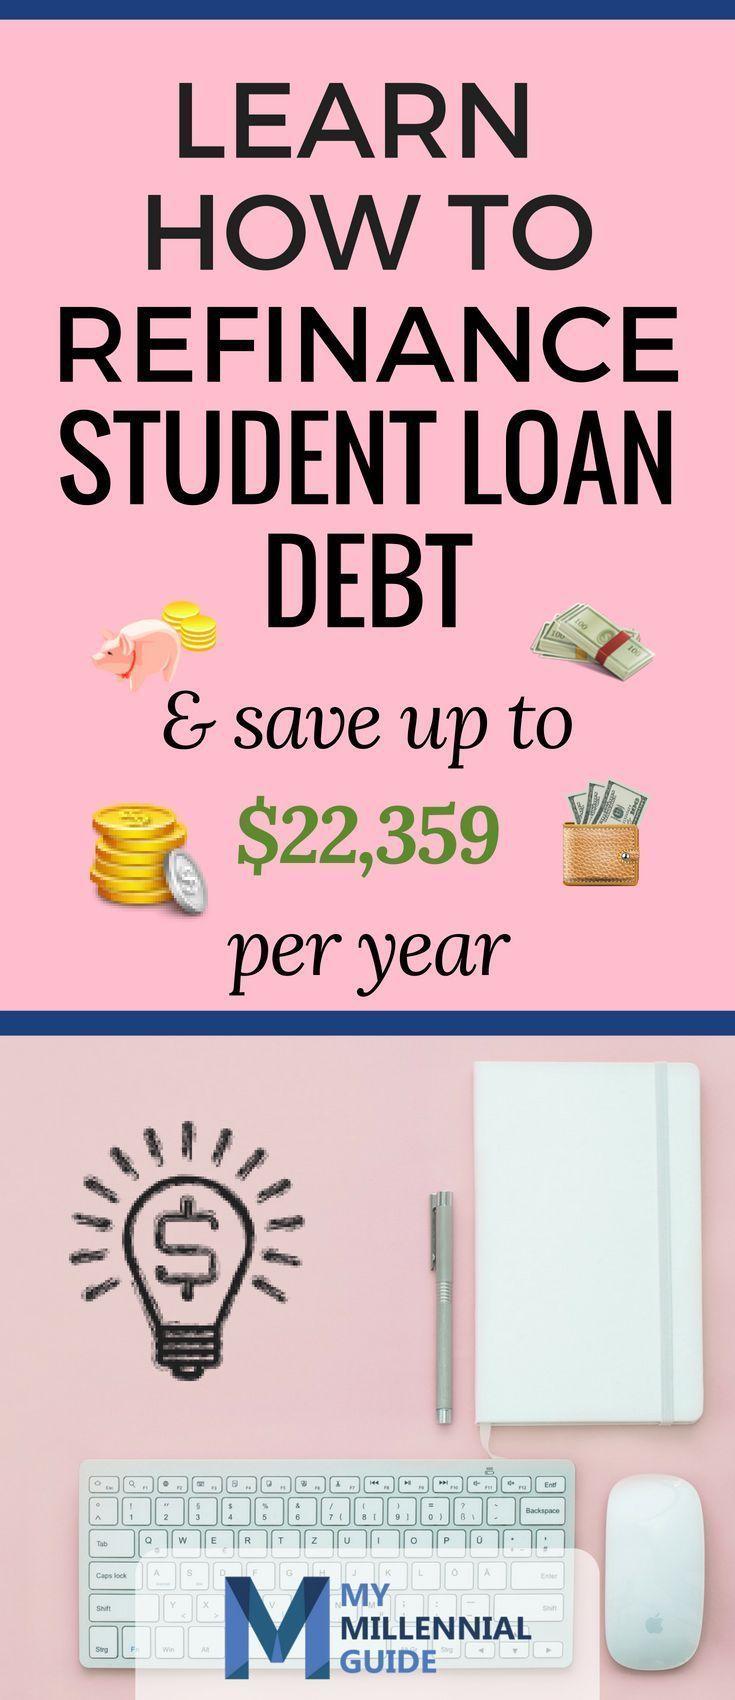 6 Best Student Loan Refinance Companies Of 2020